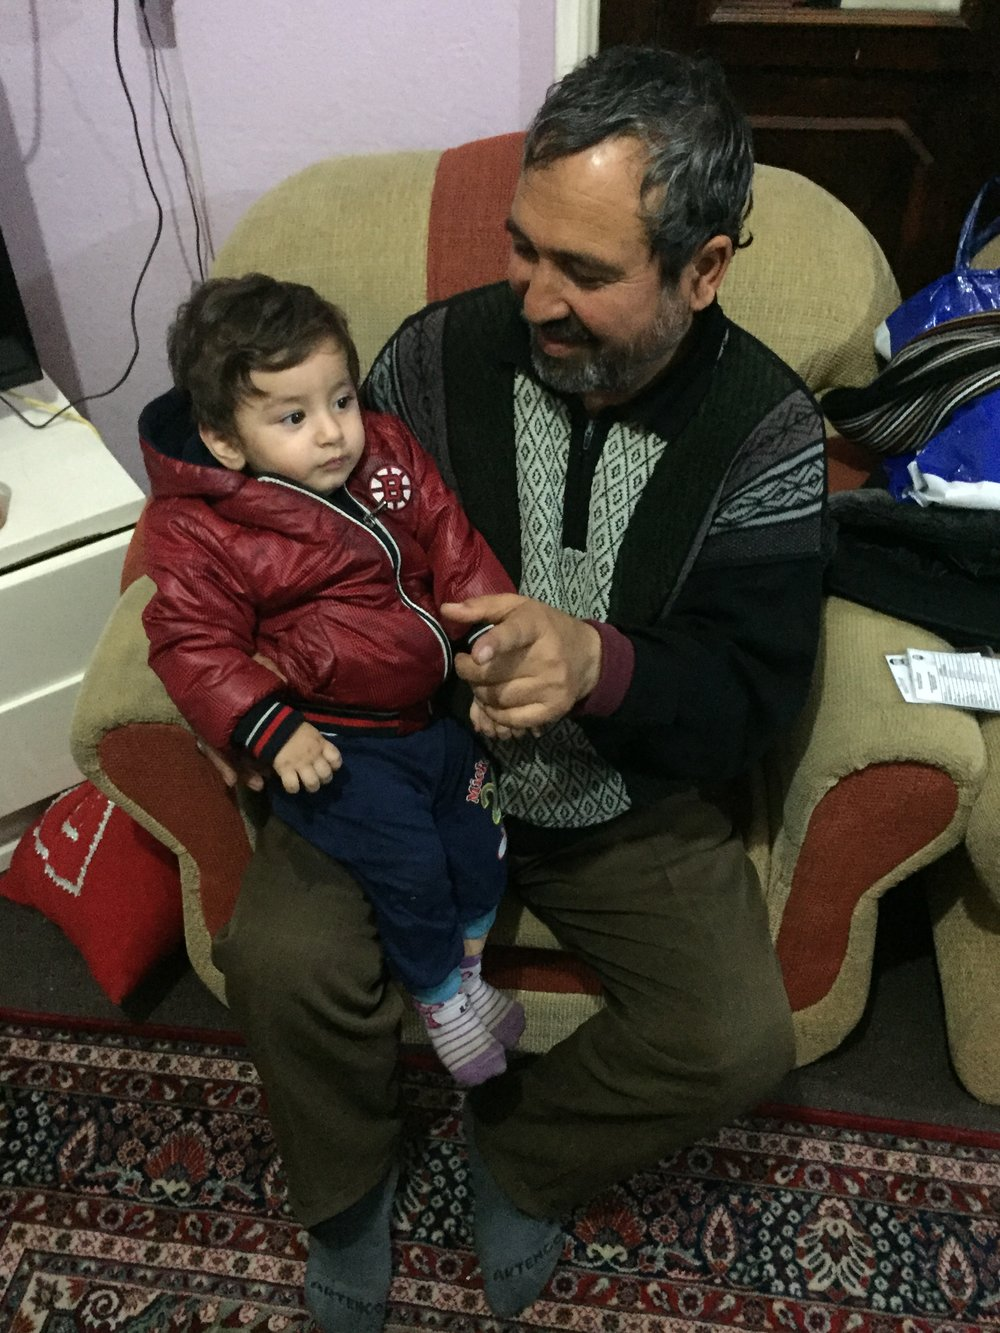 Ali, a 48-year-old Afghan asylum-seeker with his grandson in Kayseri, Turkey.